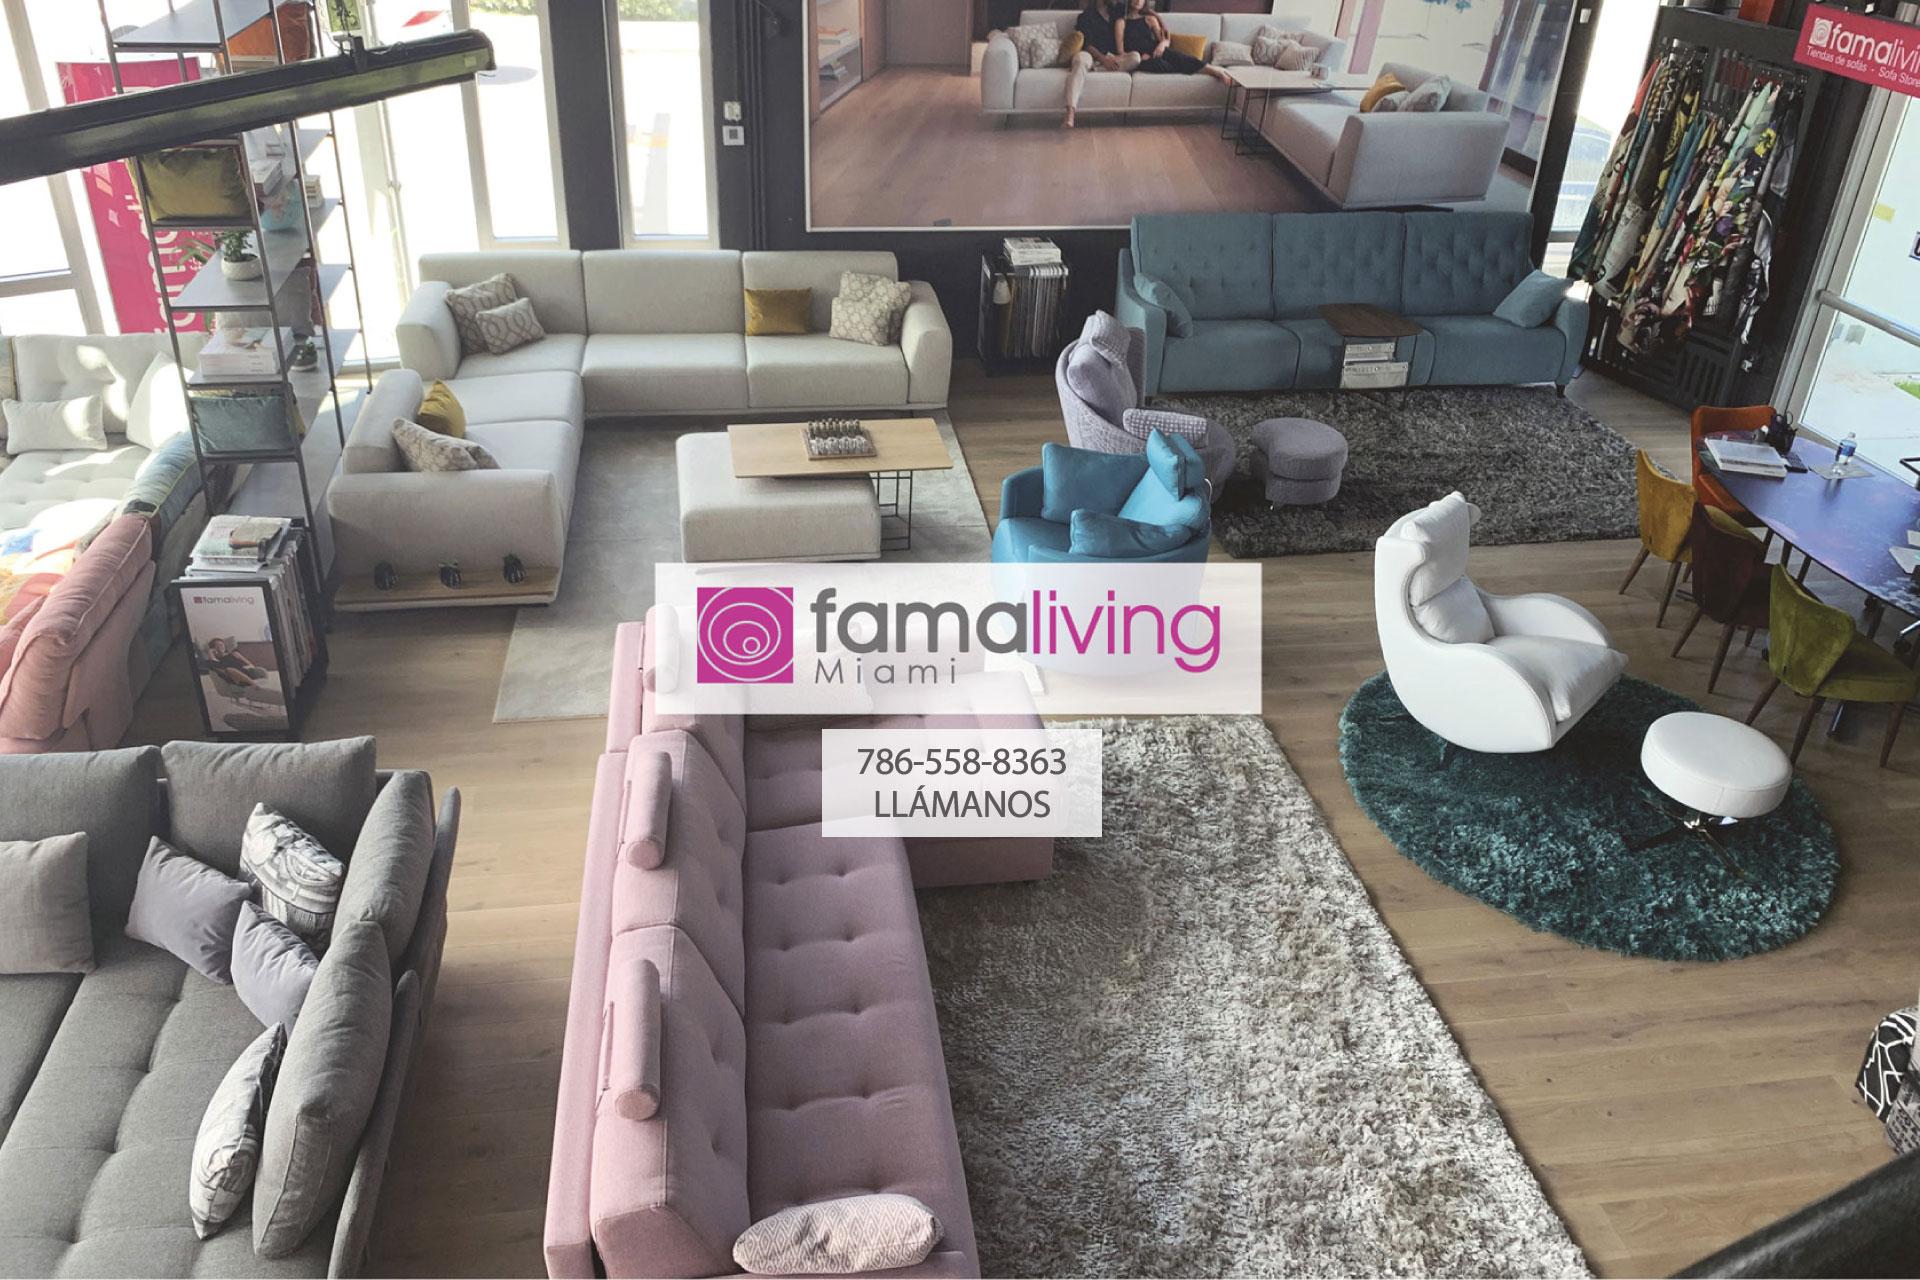 <p>Famaliving Miami | Tienda de Sofás<br></p>